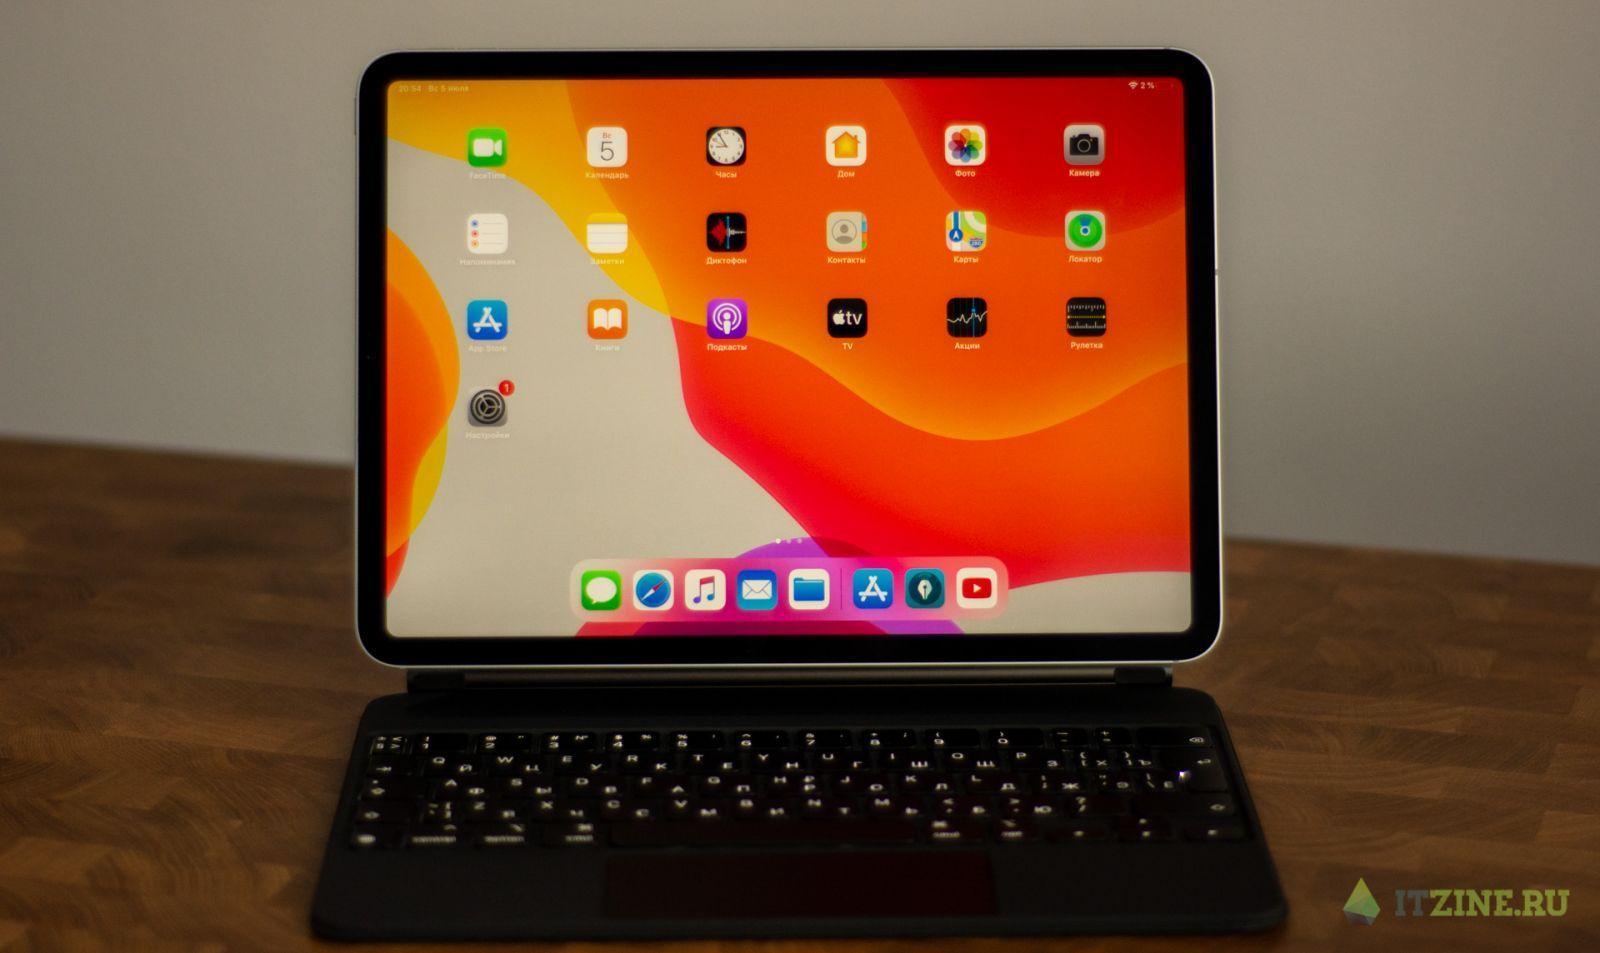 Дизайнерский рай. Обзор Apple iPad Pro 2020 + Apple Pencil + Magic Keyboard (dsc 8865)